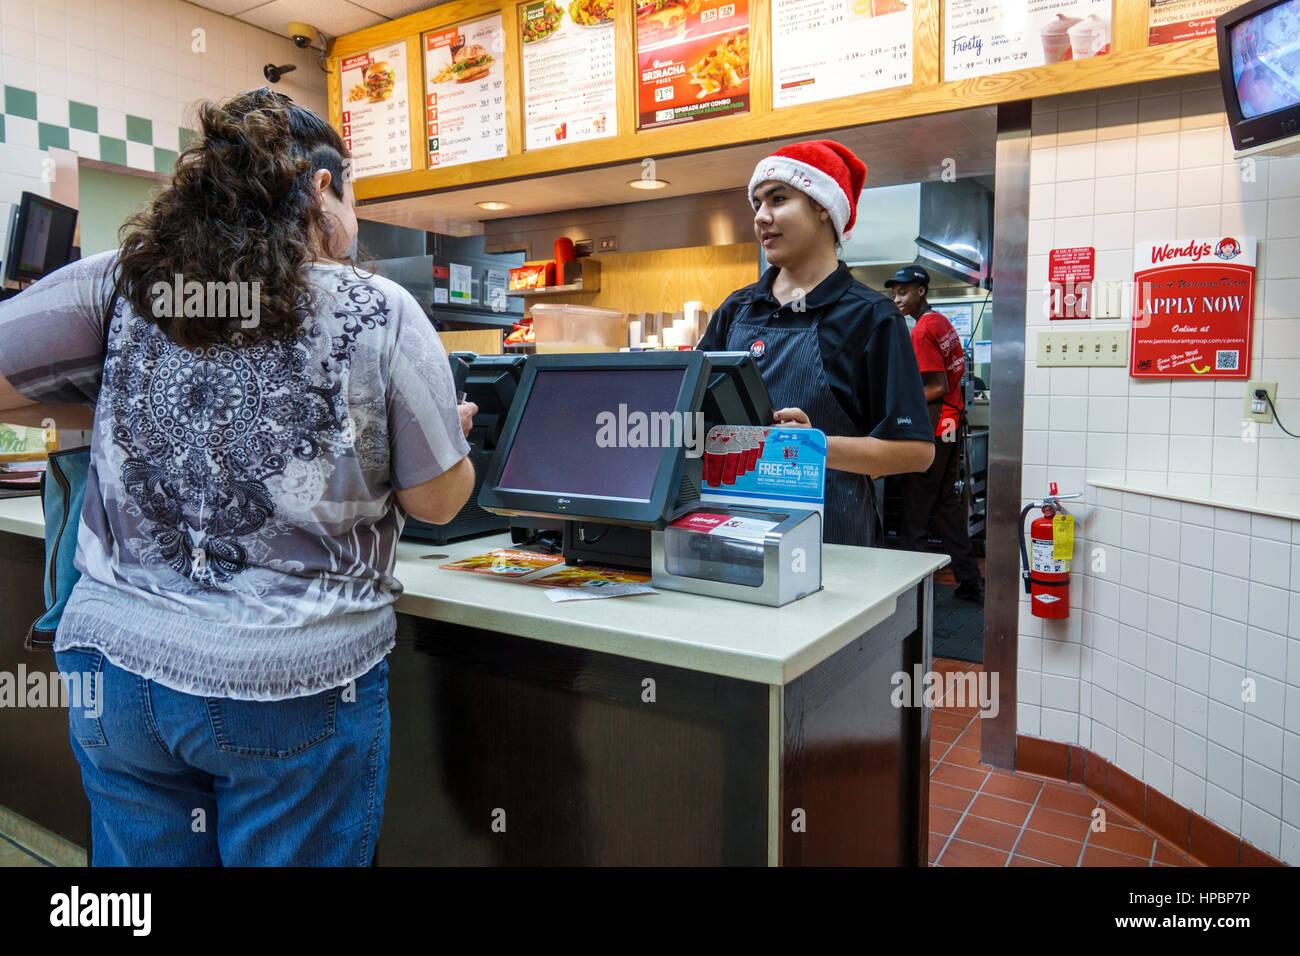 homestead florida wendys restaurant hamburger fast food cashier customer woman boy teen counter ordering job employee wearing santa hat